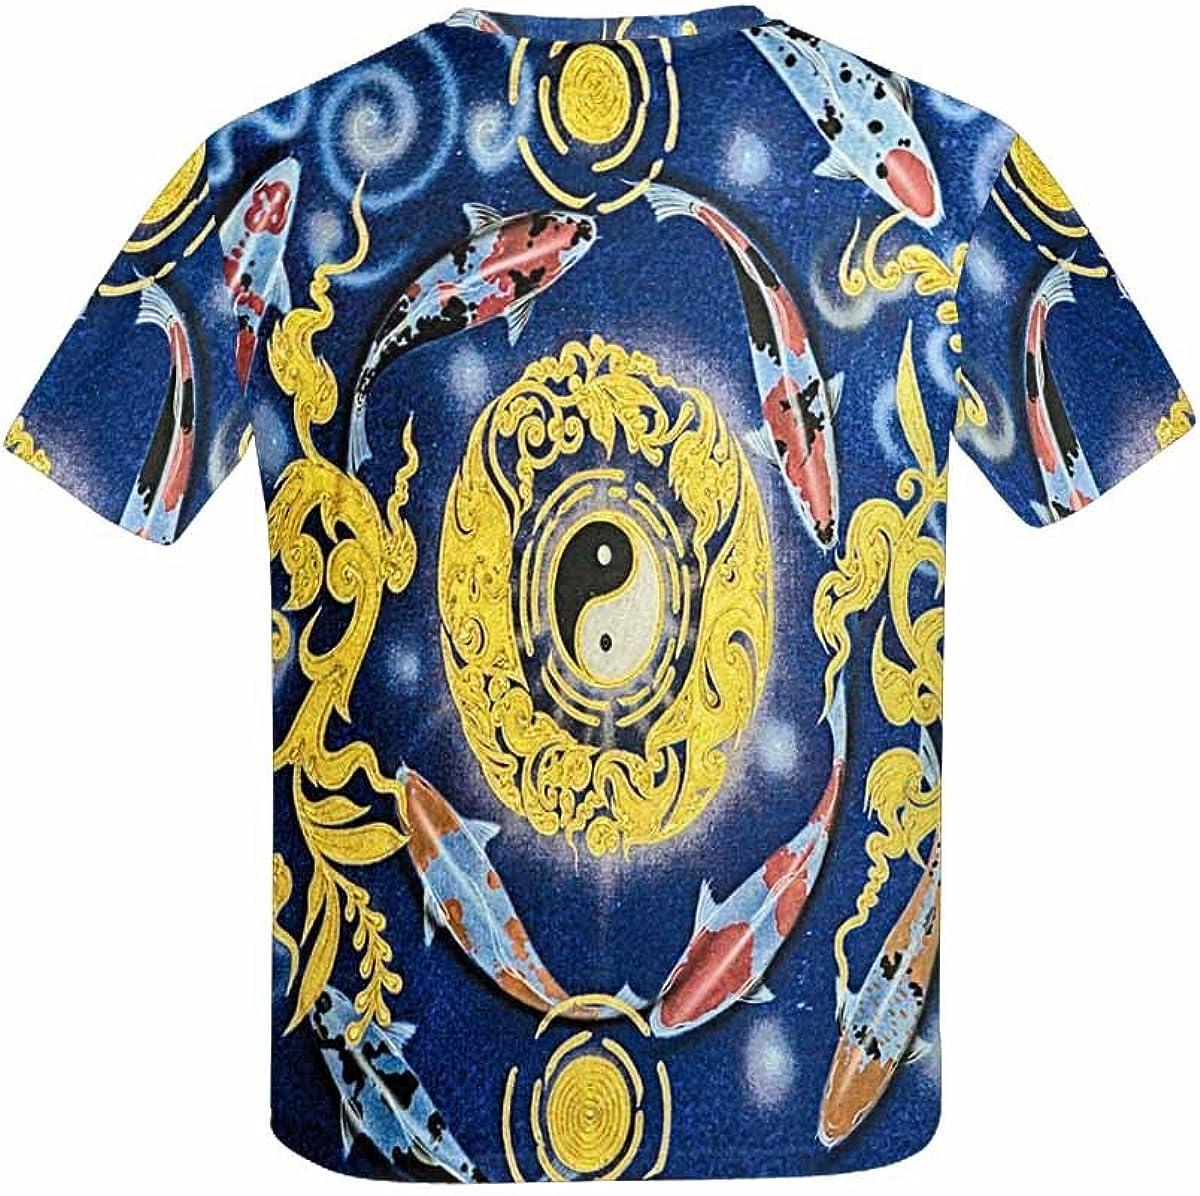 INTERESTPRINT Childs T-Shirt Koi Carps XS-XL